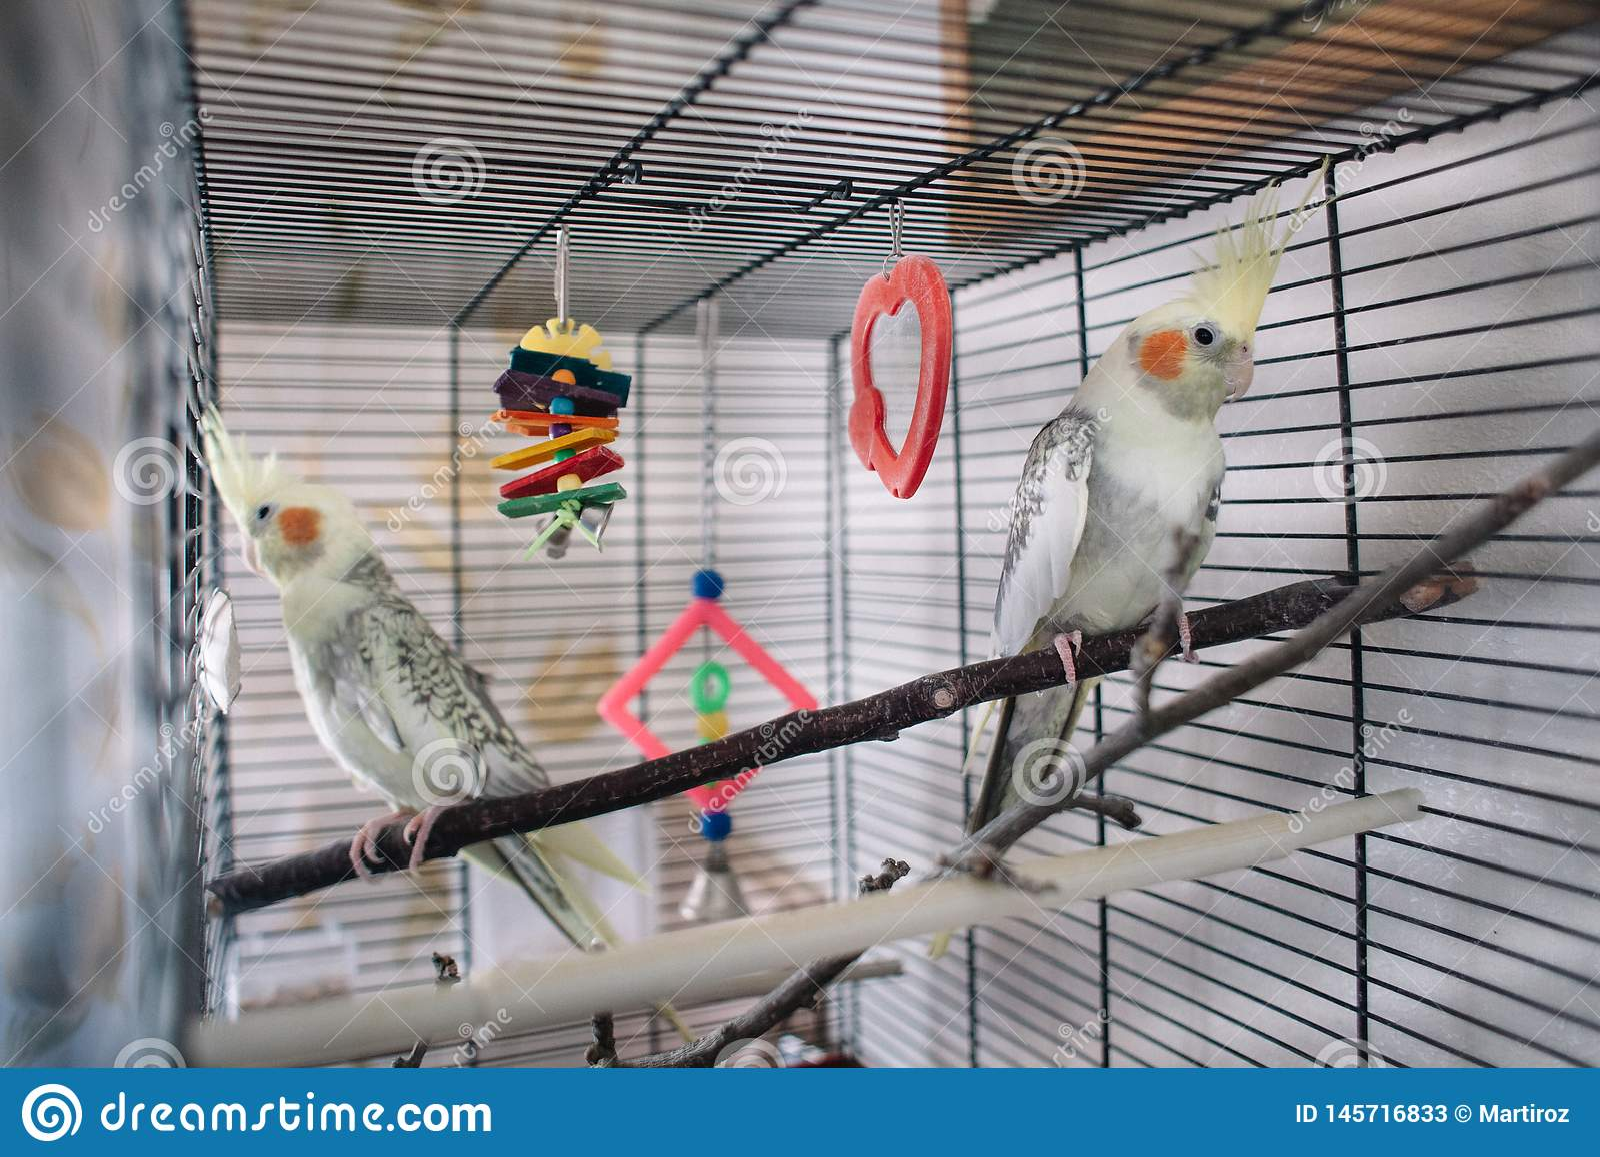 Pary piękna biała papuga w klatce